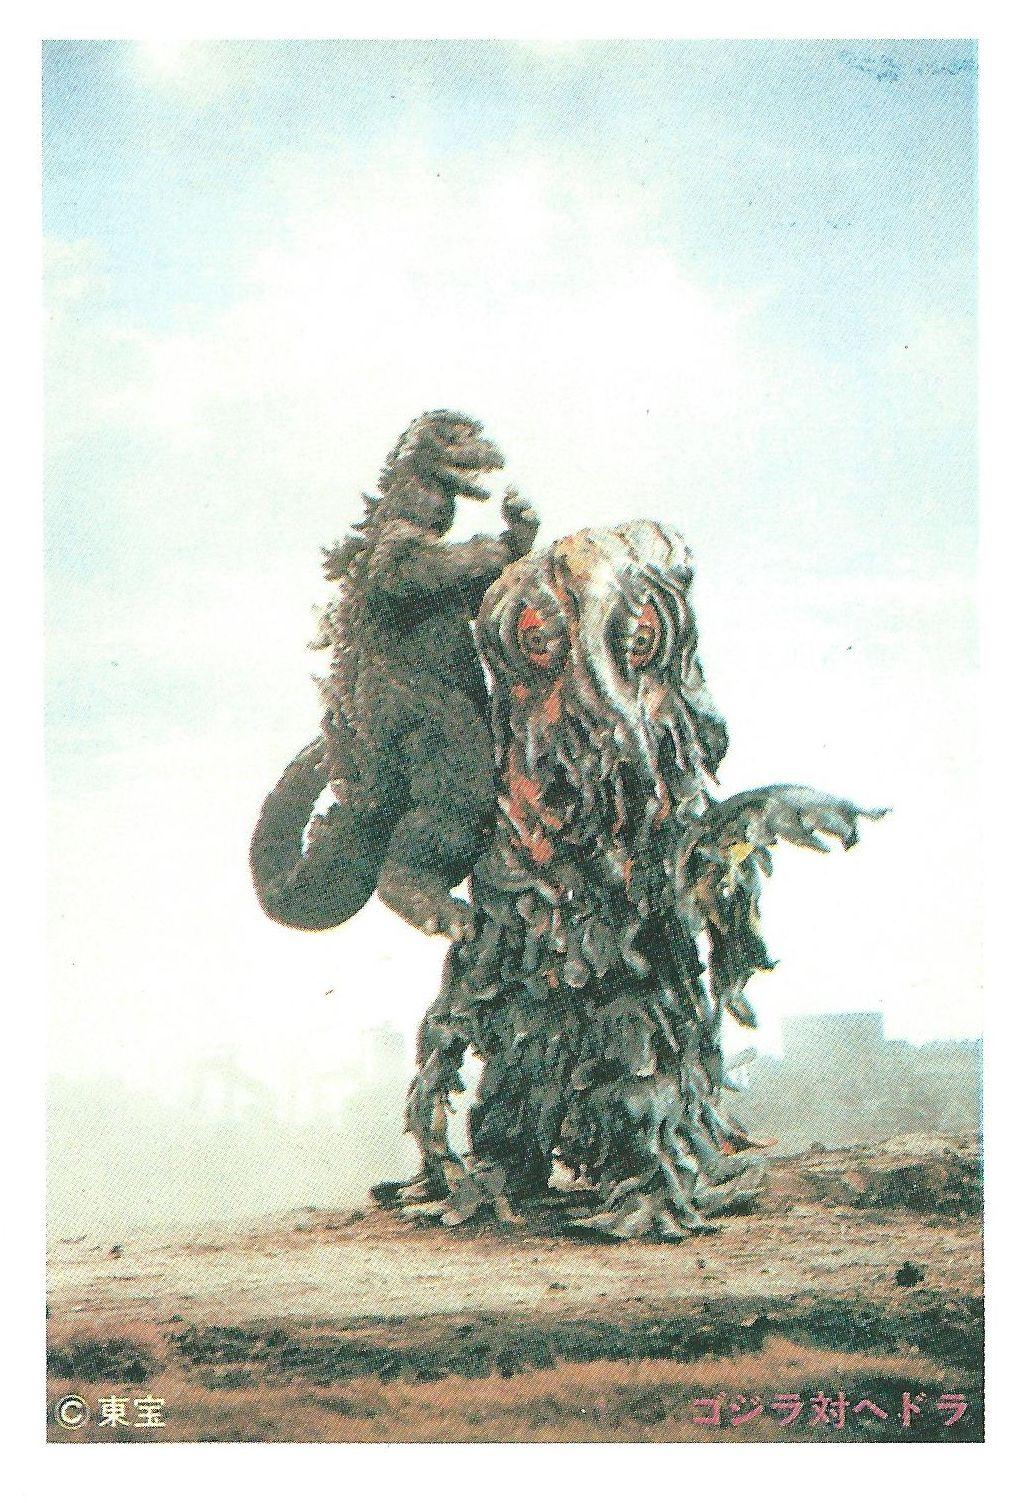 The Sphinx Godzilla Color Bromide Set Part 18 Godzilla